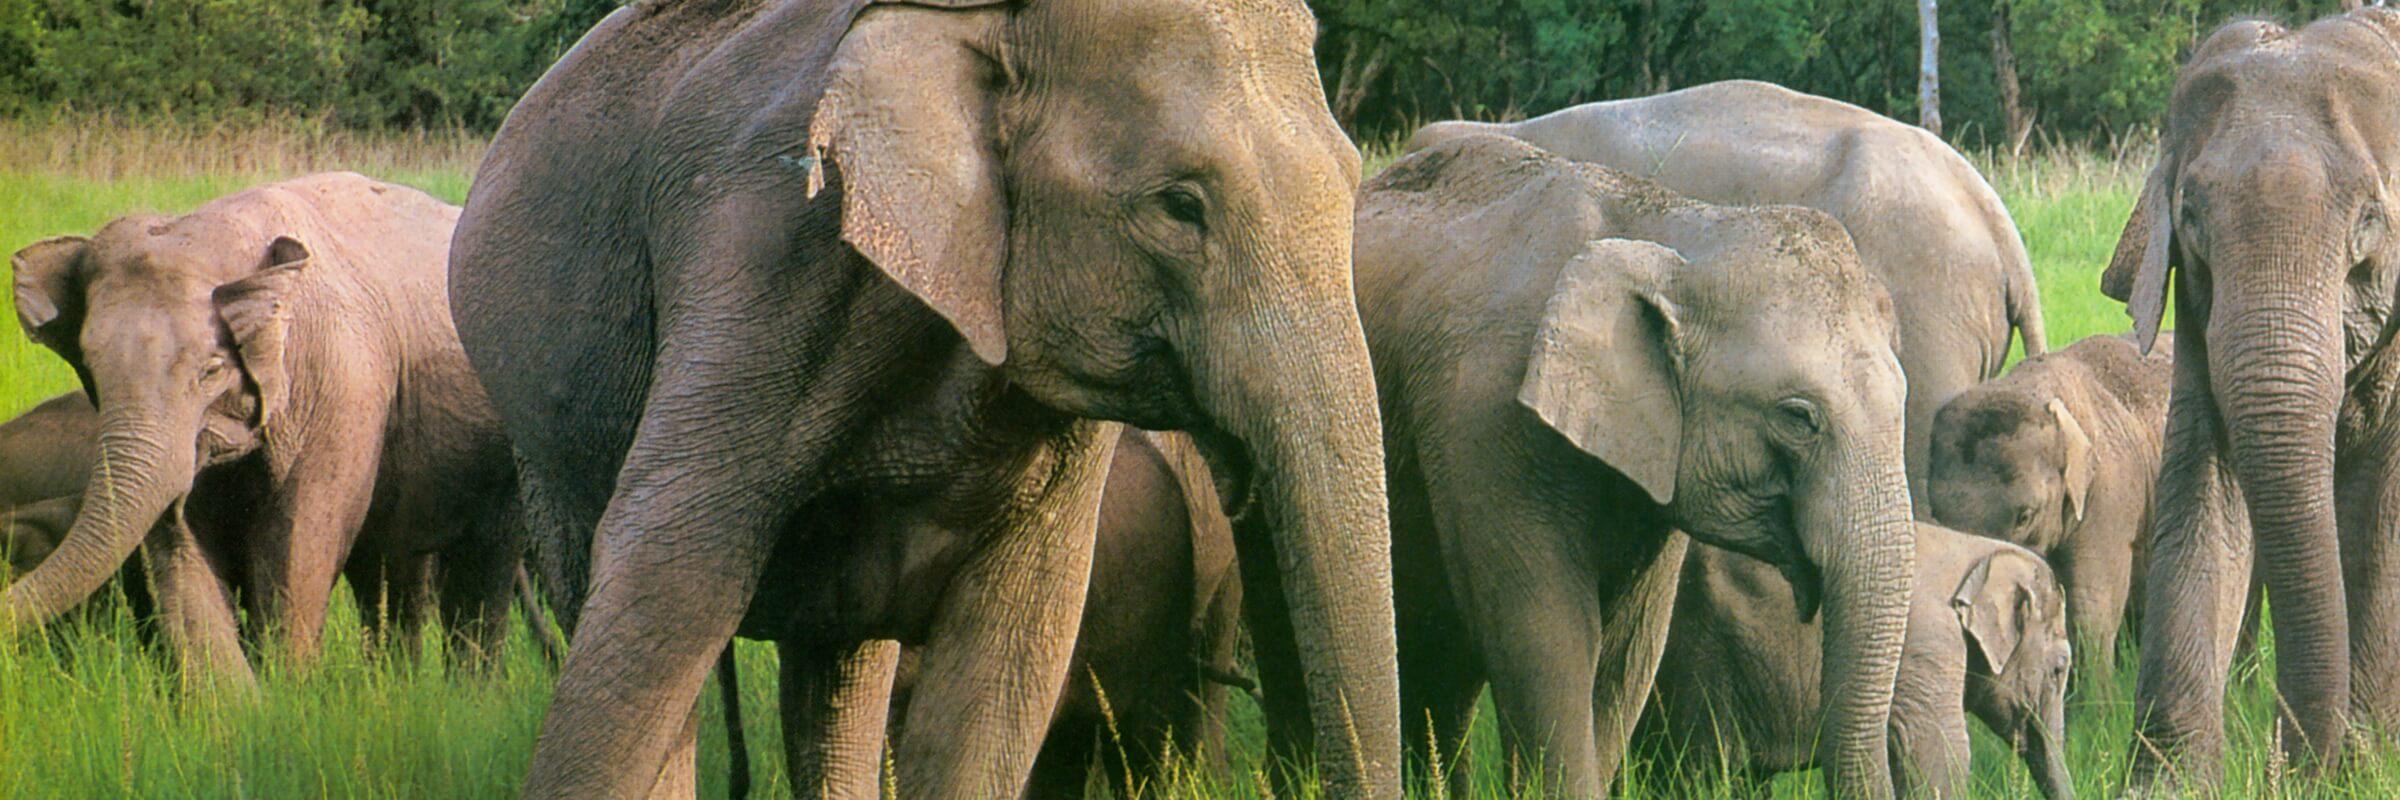 Eine Horde indischer Elefanten – Elefantenhöhlen